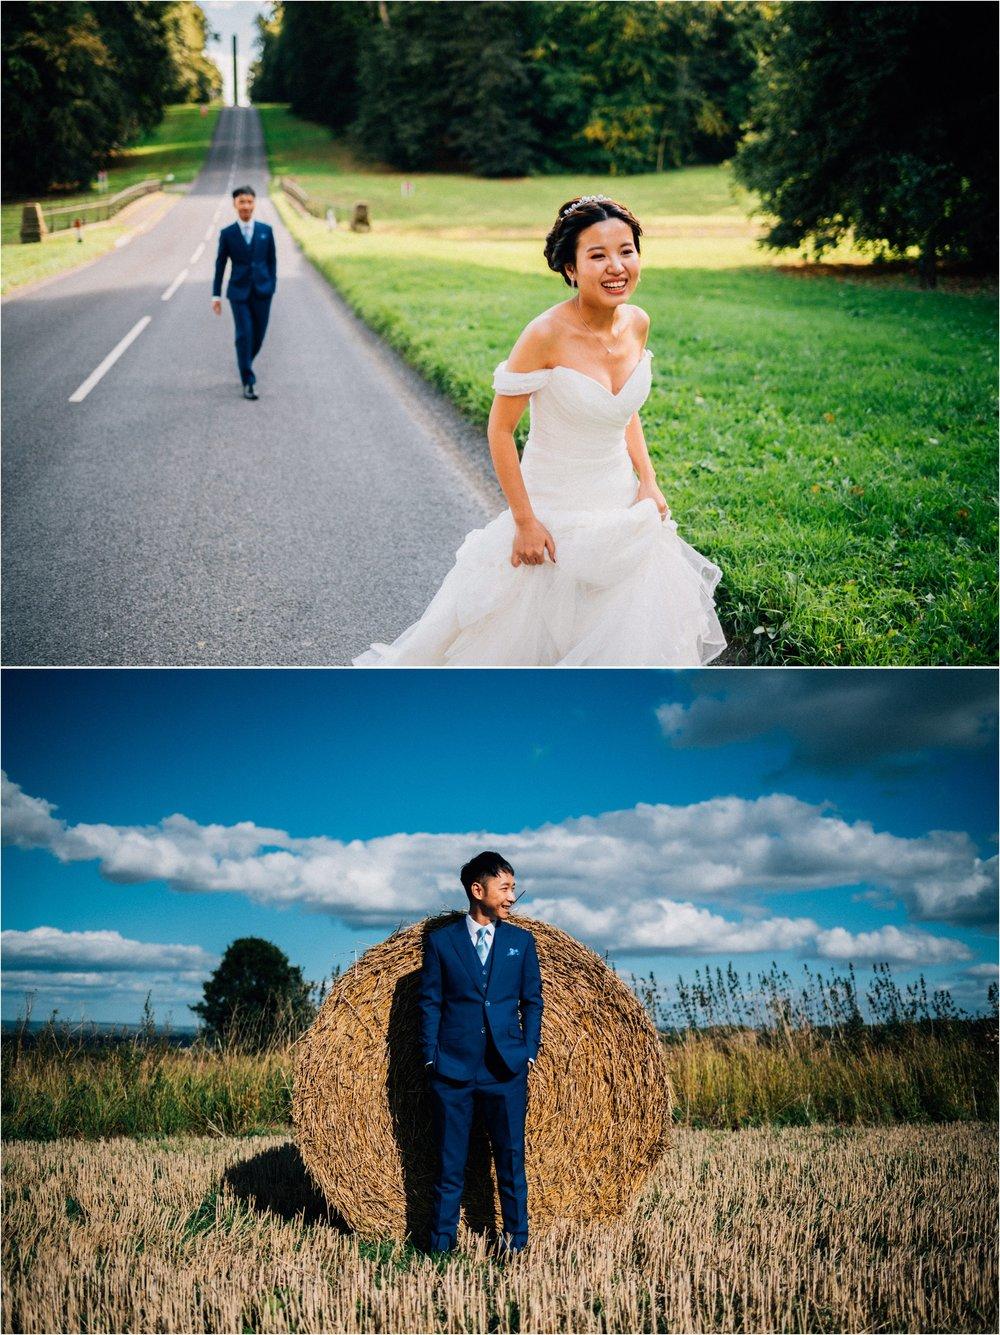 York city elopement wedding photographer_0197.jpg